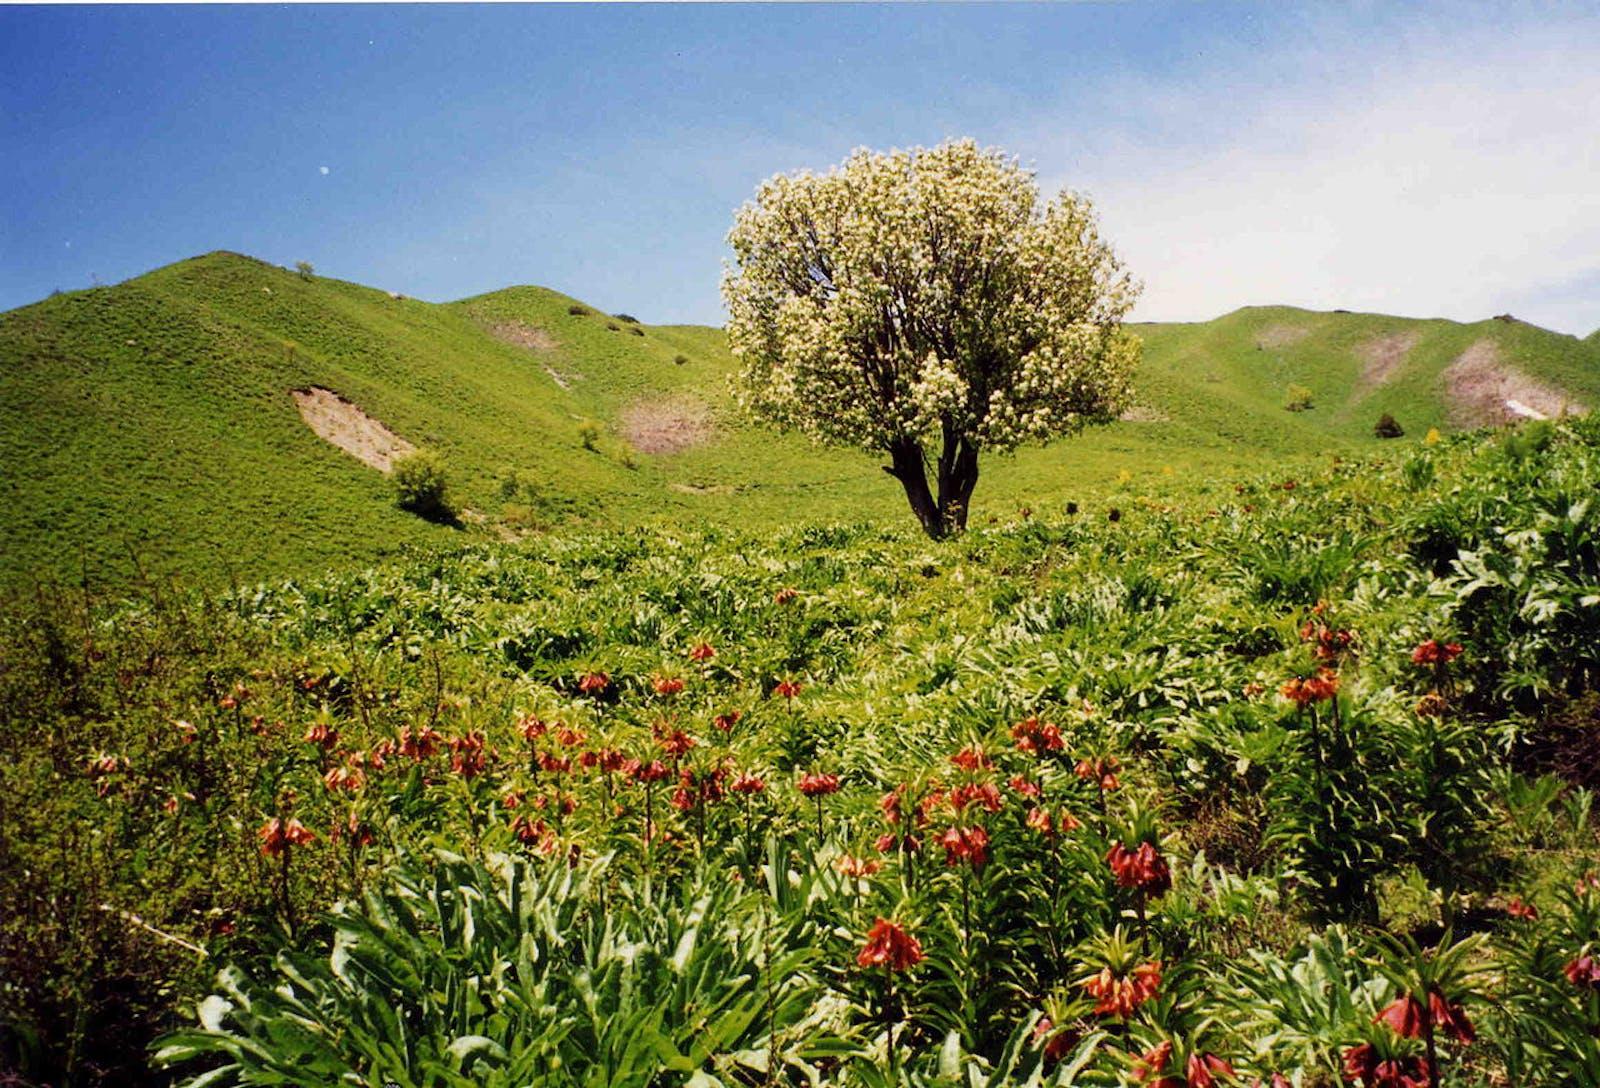 Pamir Alpine Desert and Tundra